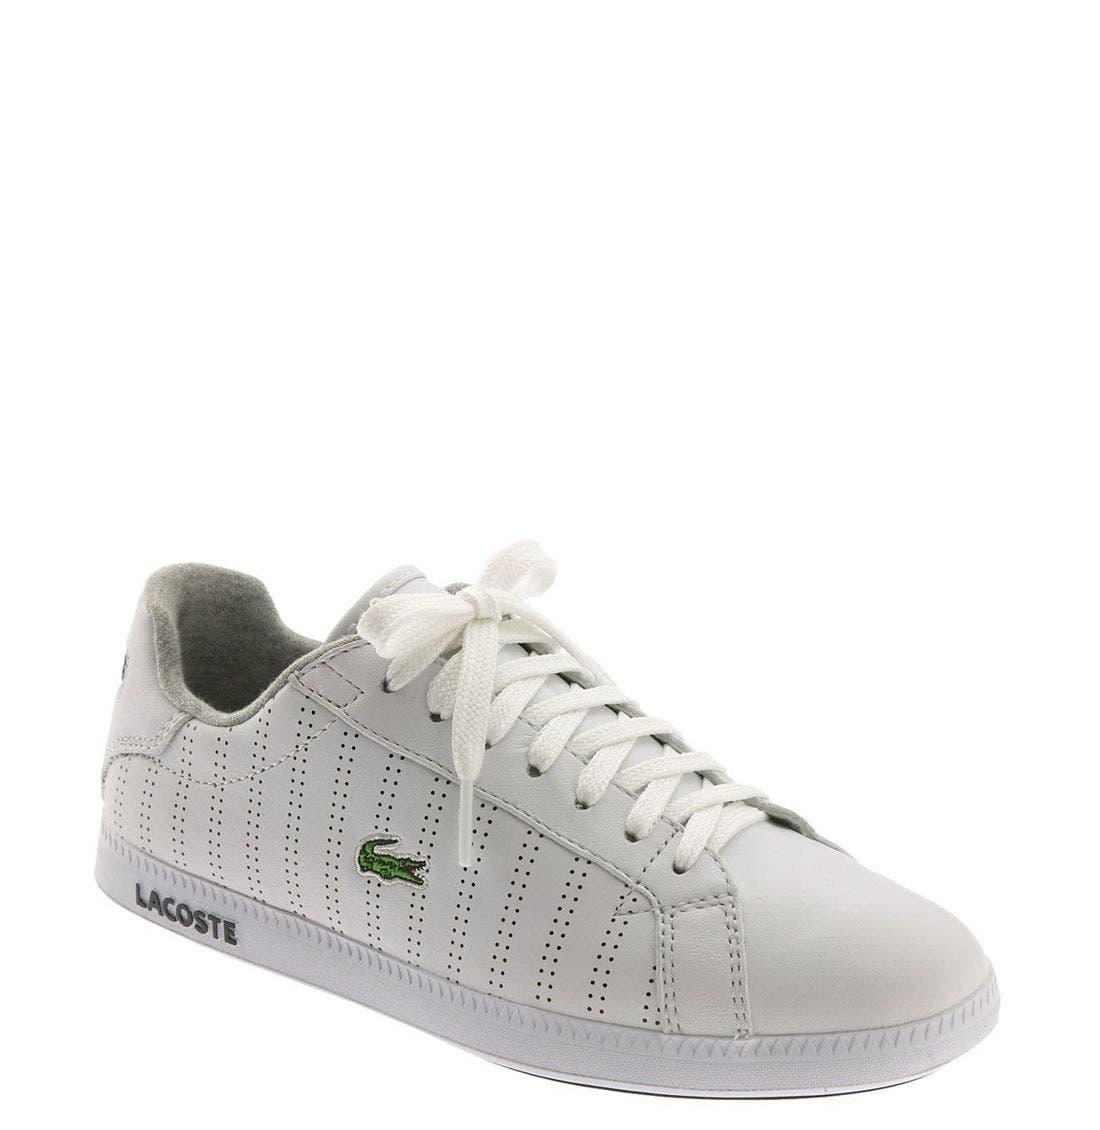 Main Image - Lacoste 'Graduate' Pinstripe Sneaker